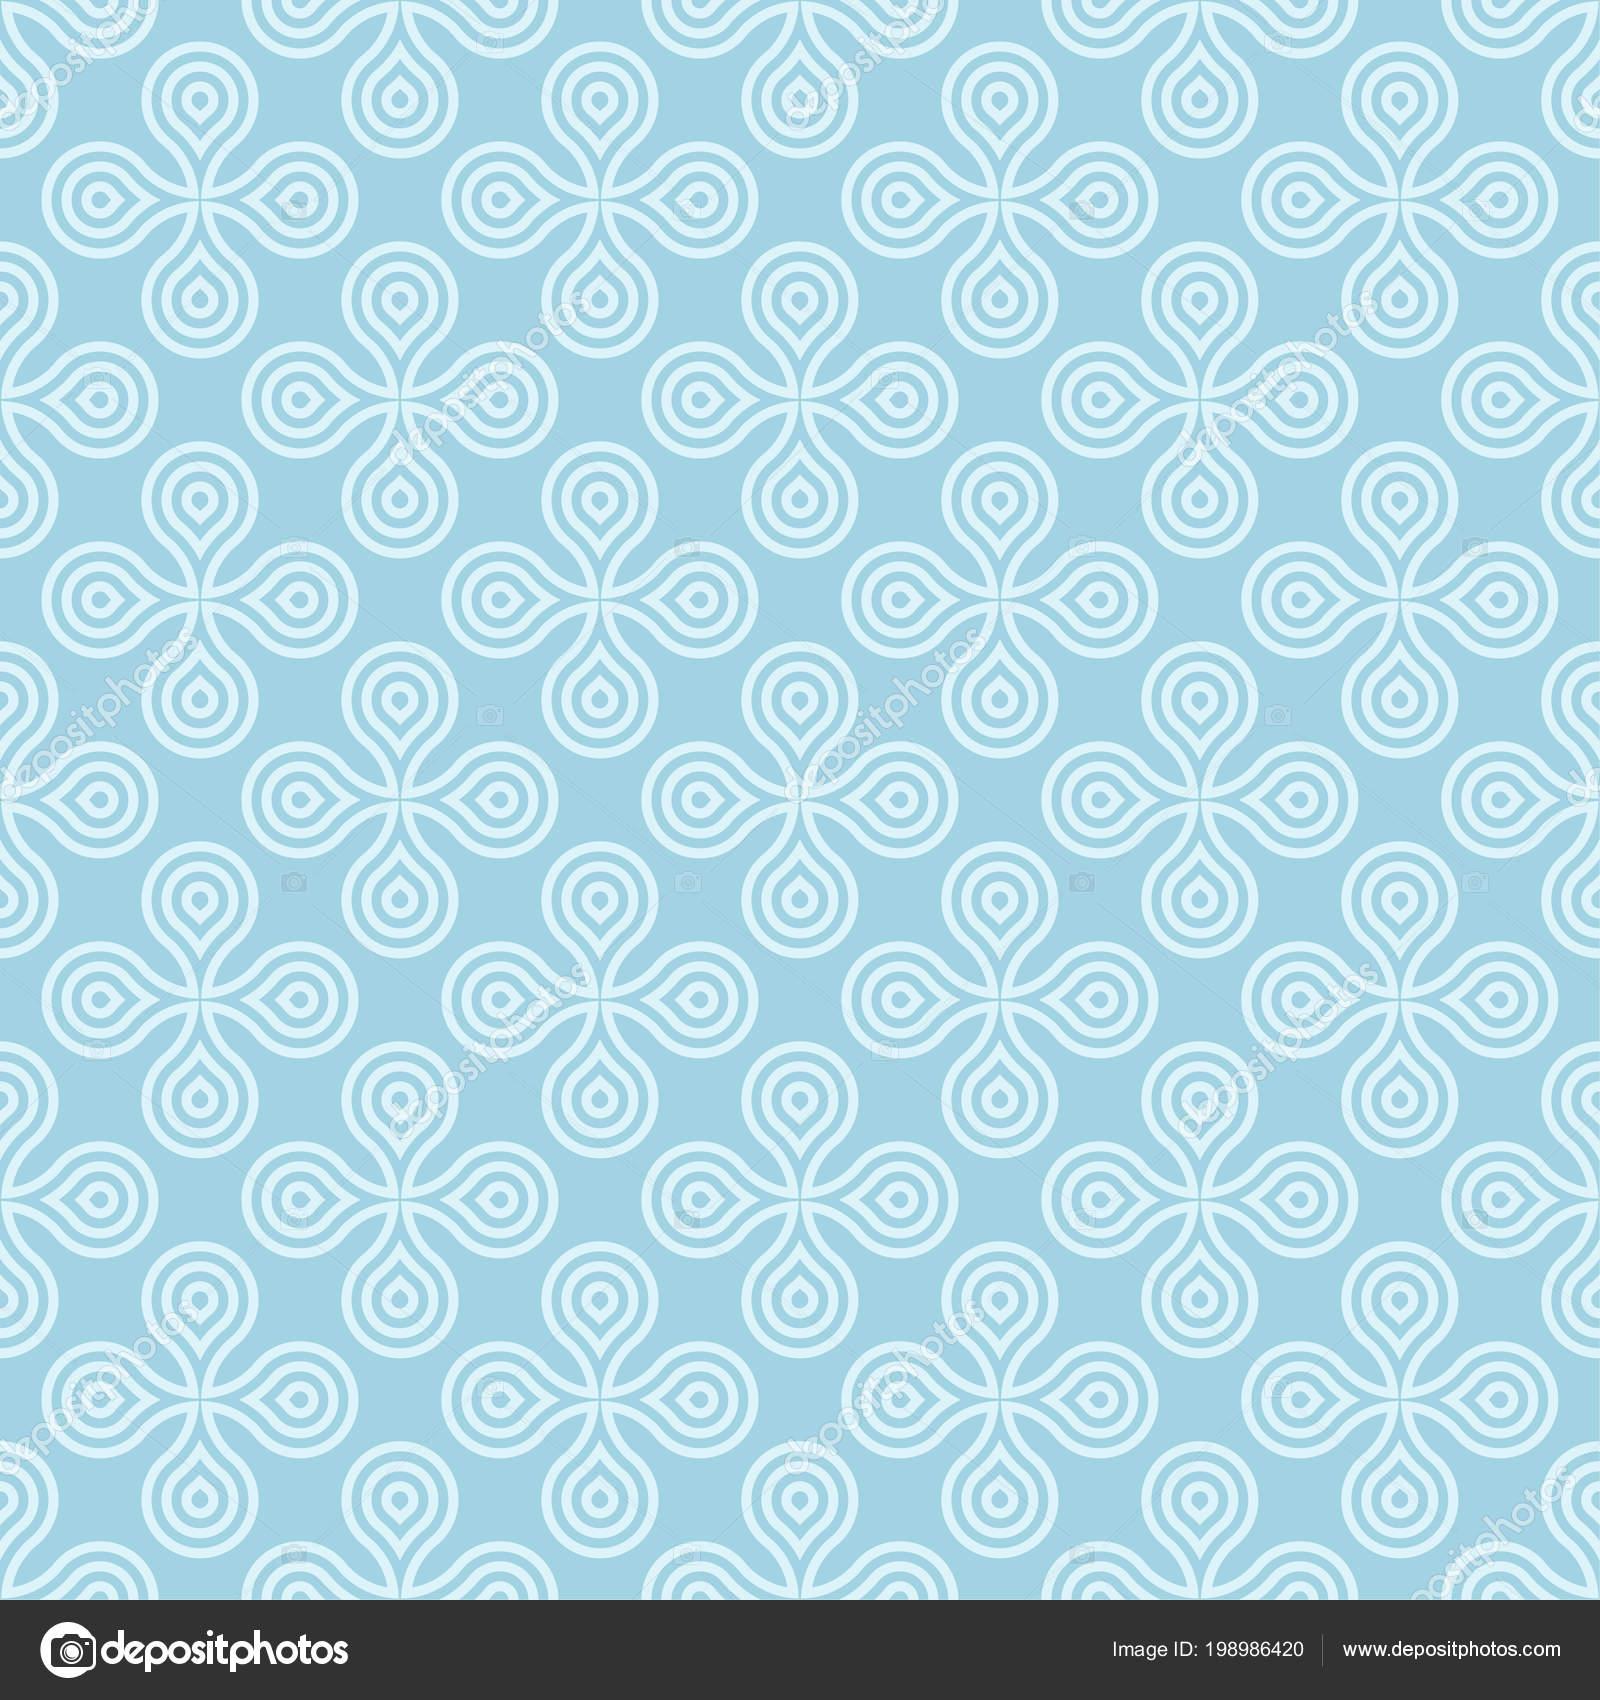 Light Blue Geometric Print Seamless Pattern Web Textile Wallpapers